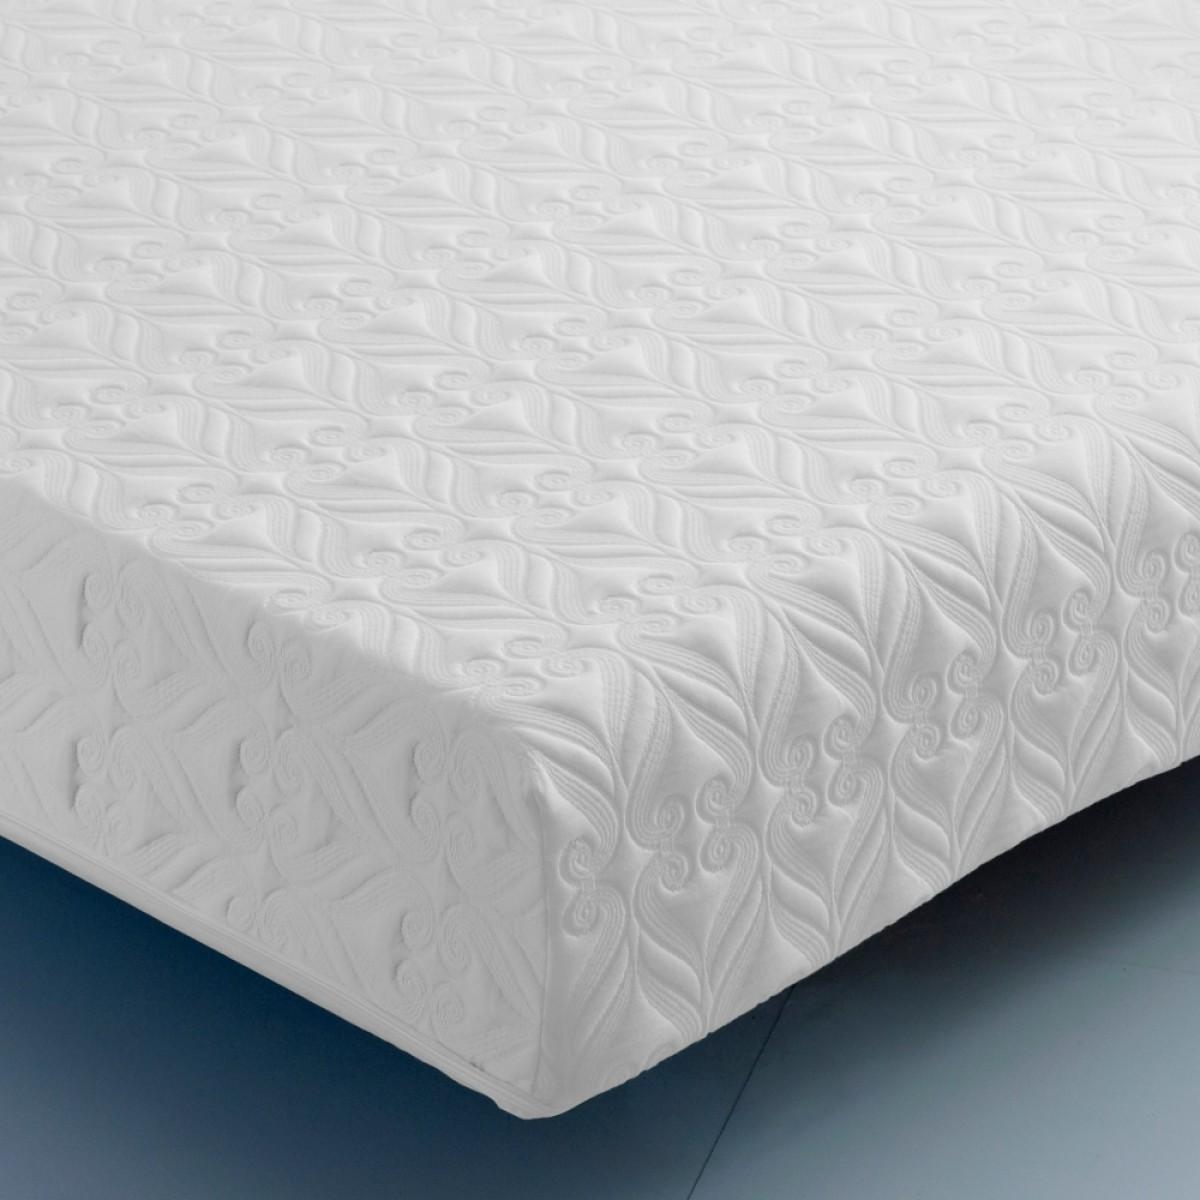 Pocket Comfort 3000 Individual Sprung Reflex Foam Support Orthopaedic Rolled Mattress